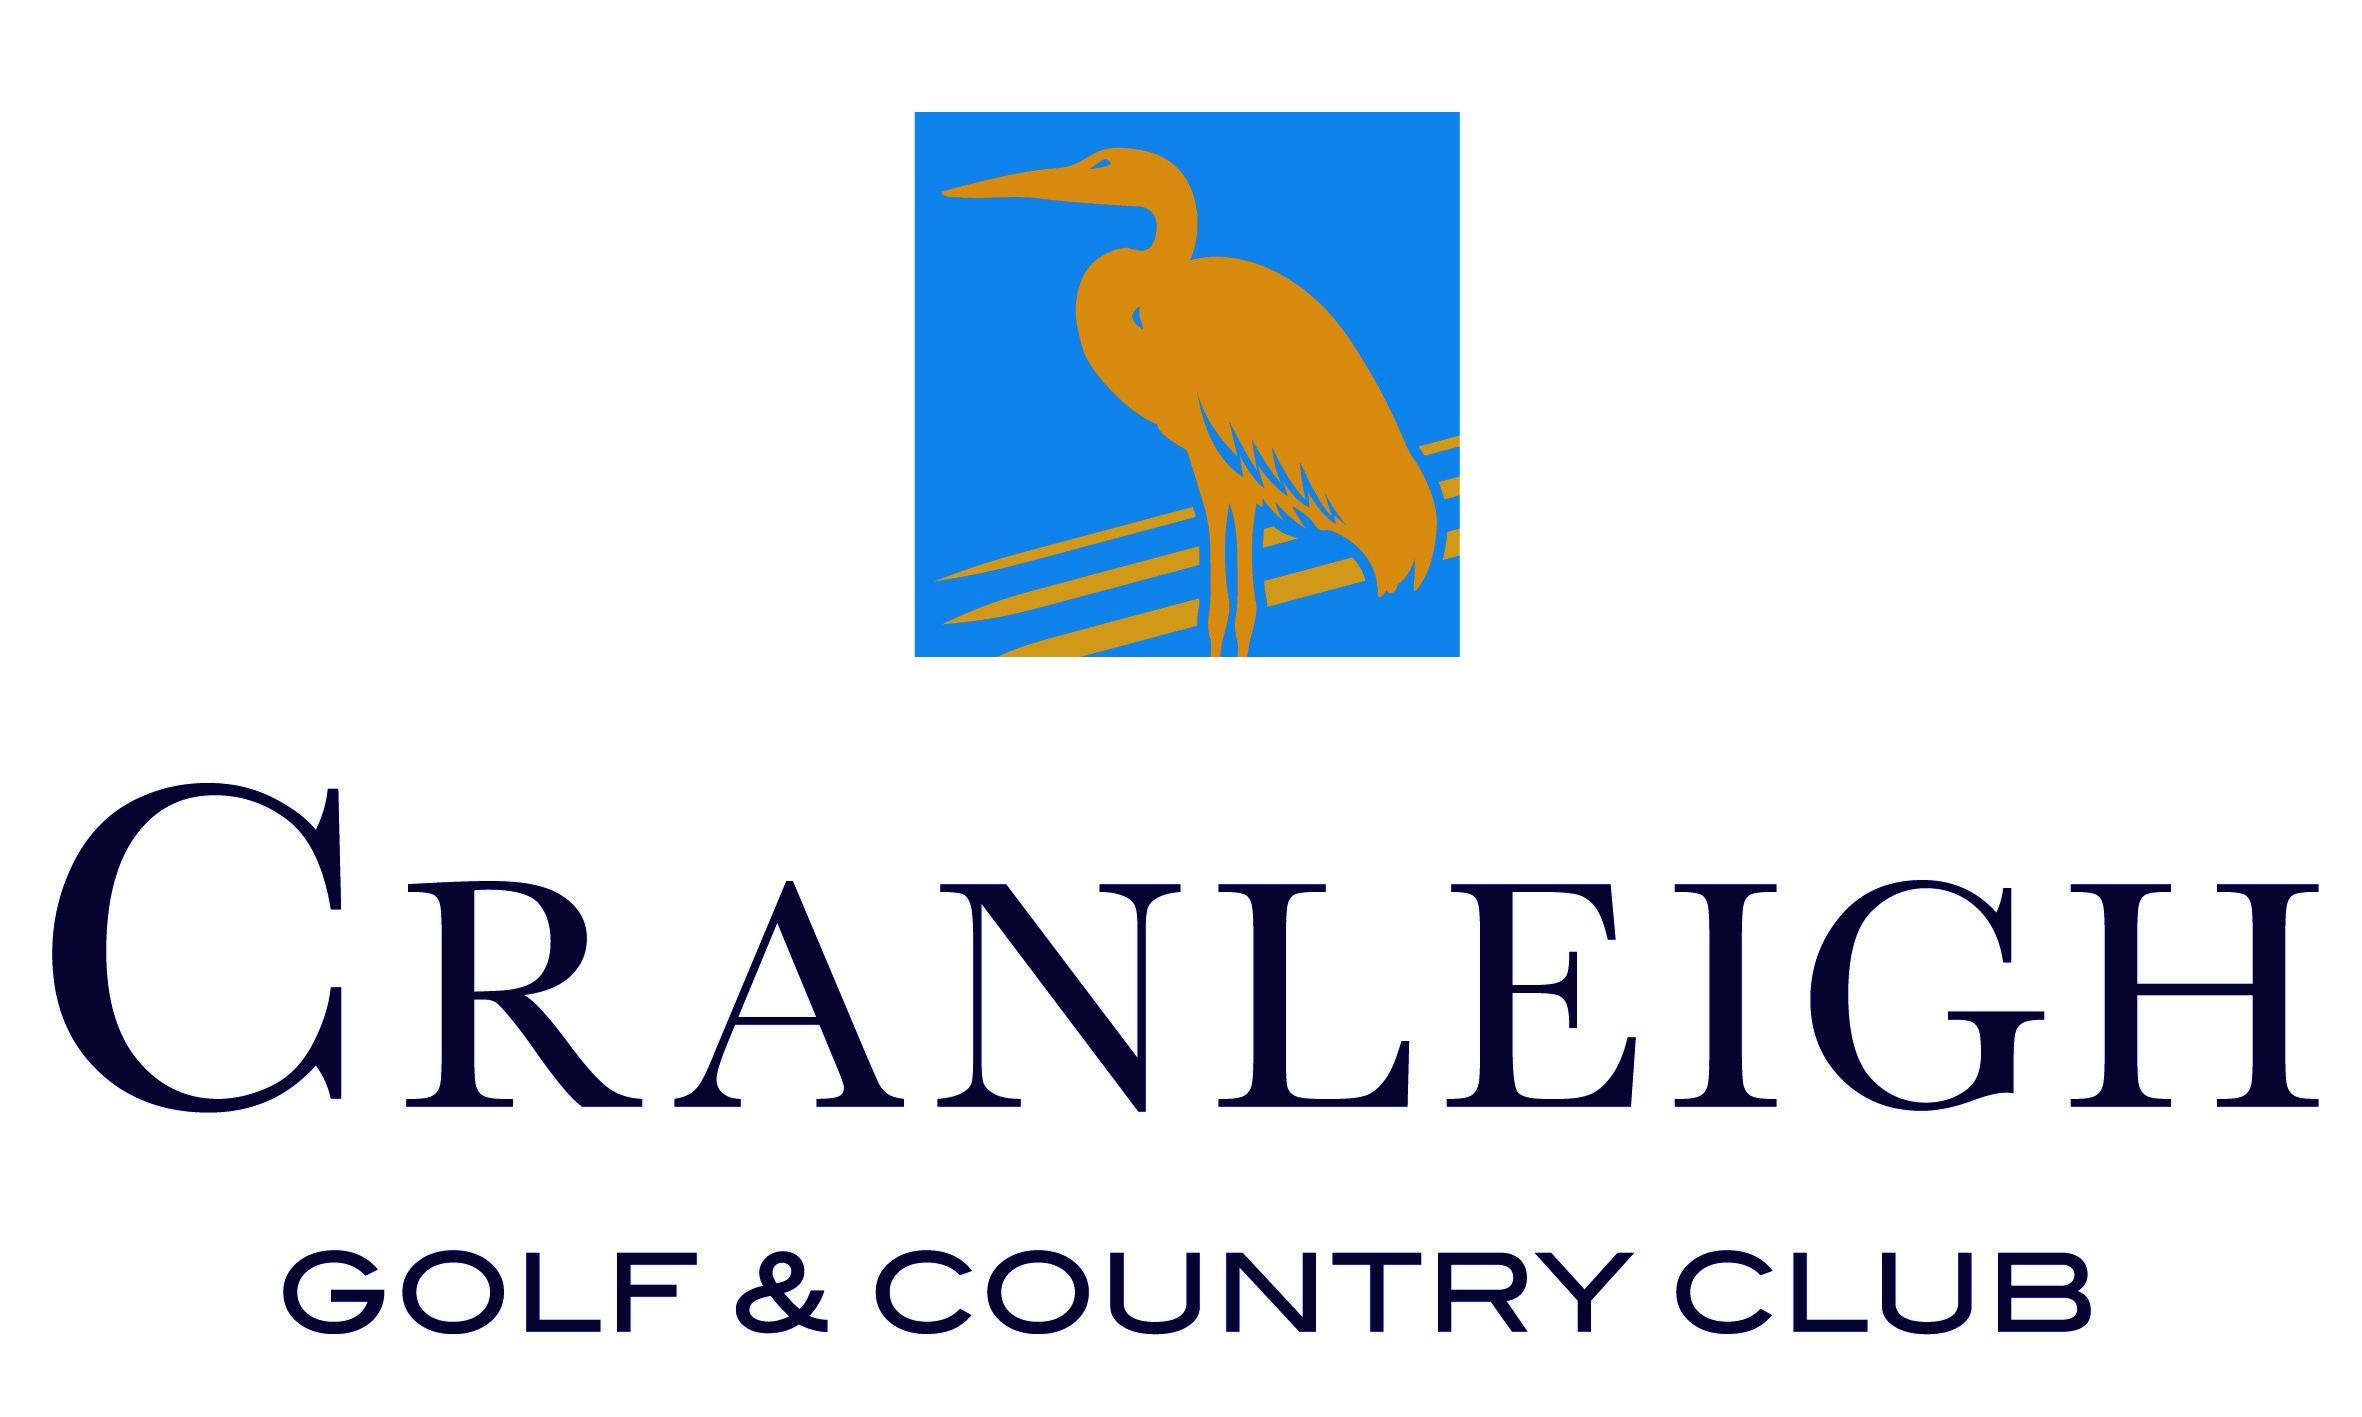 cranleigh golf logo.jpg